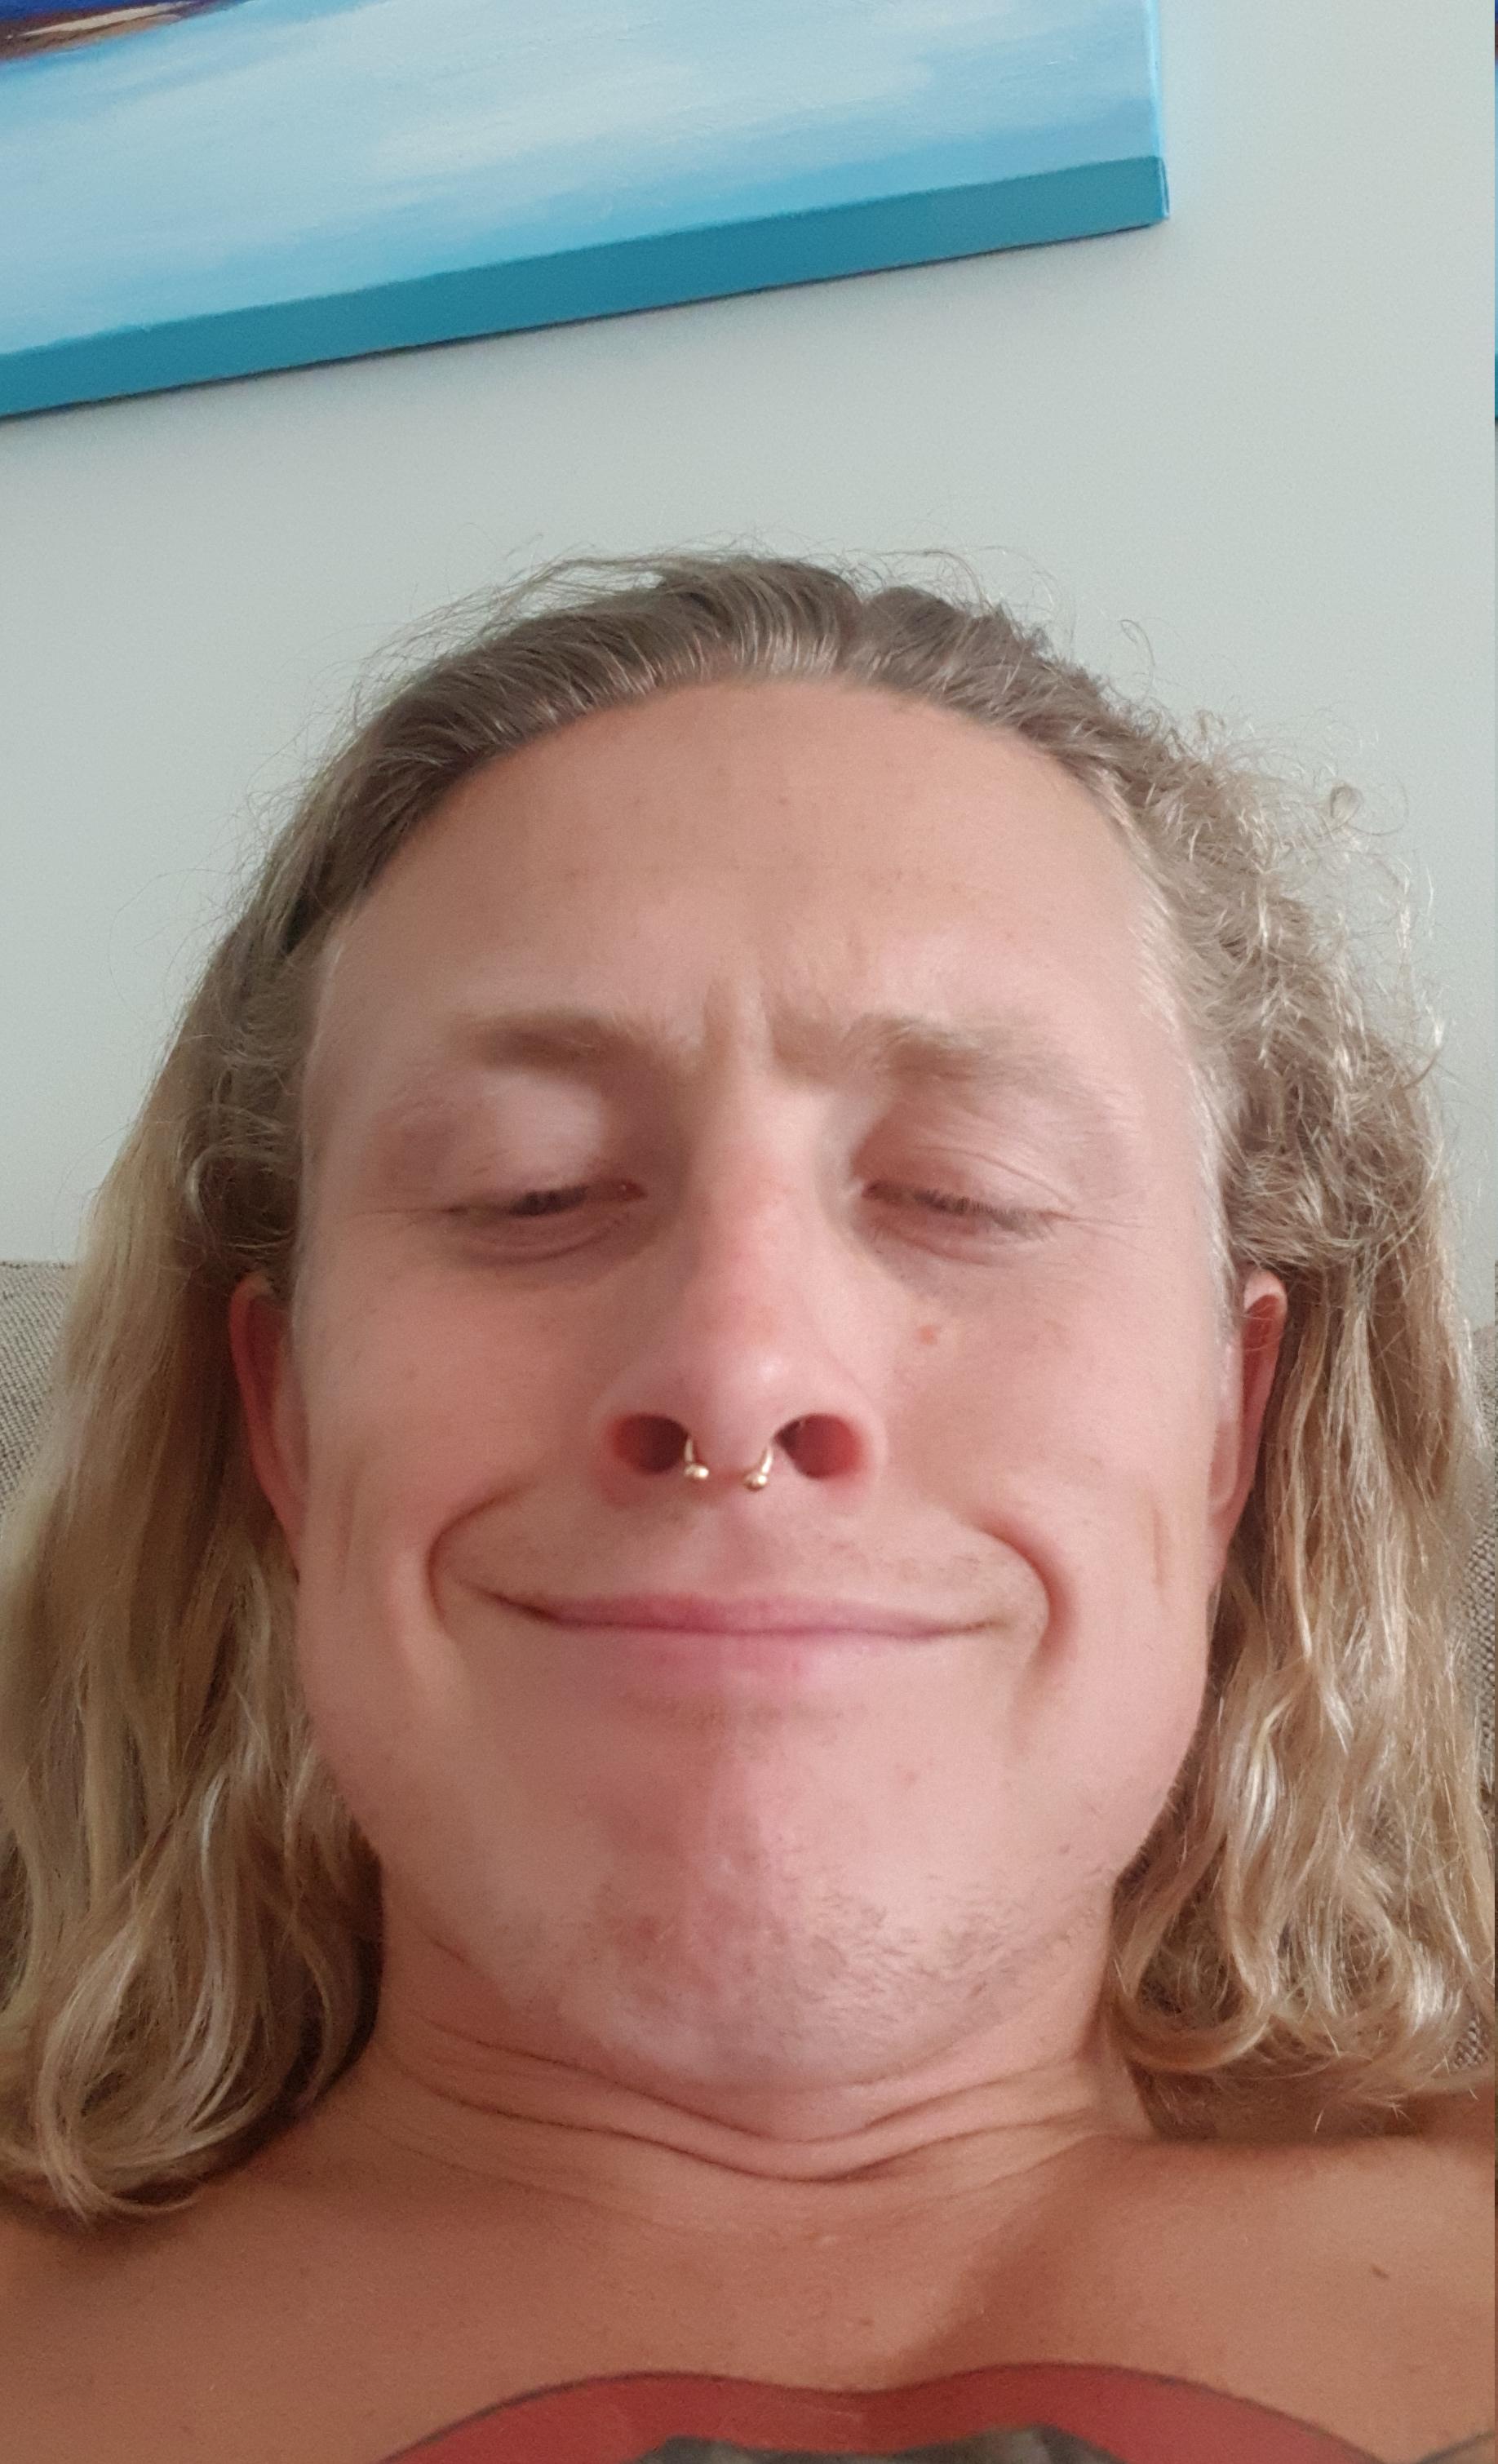 joey.hextall on One Bite Pizza App